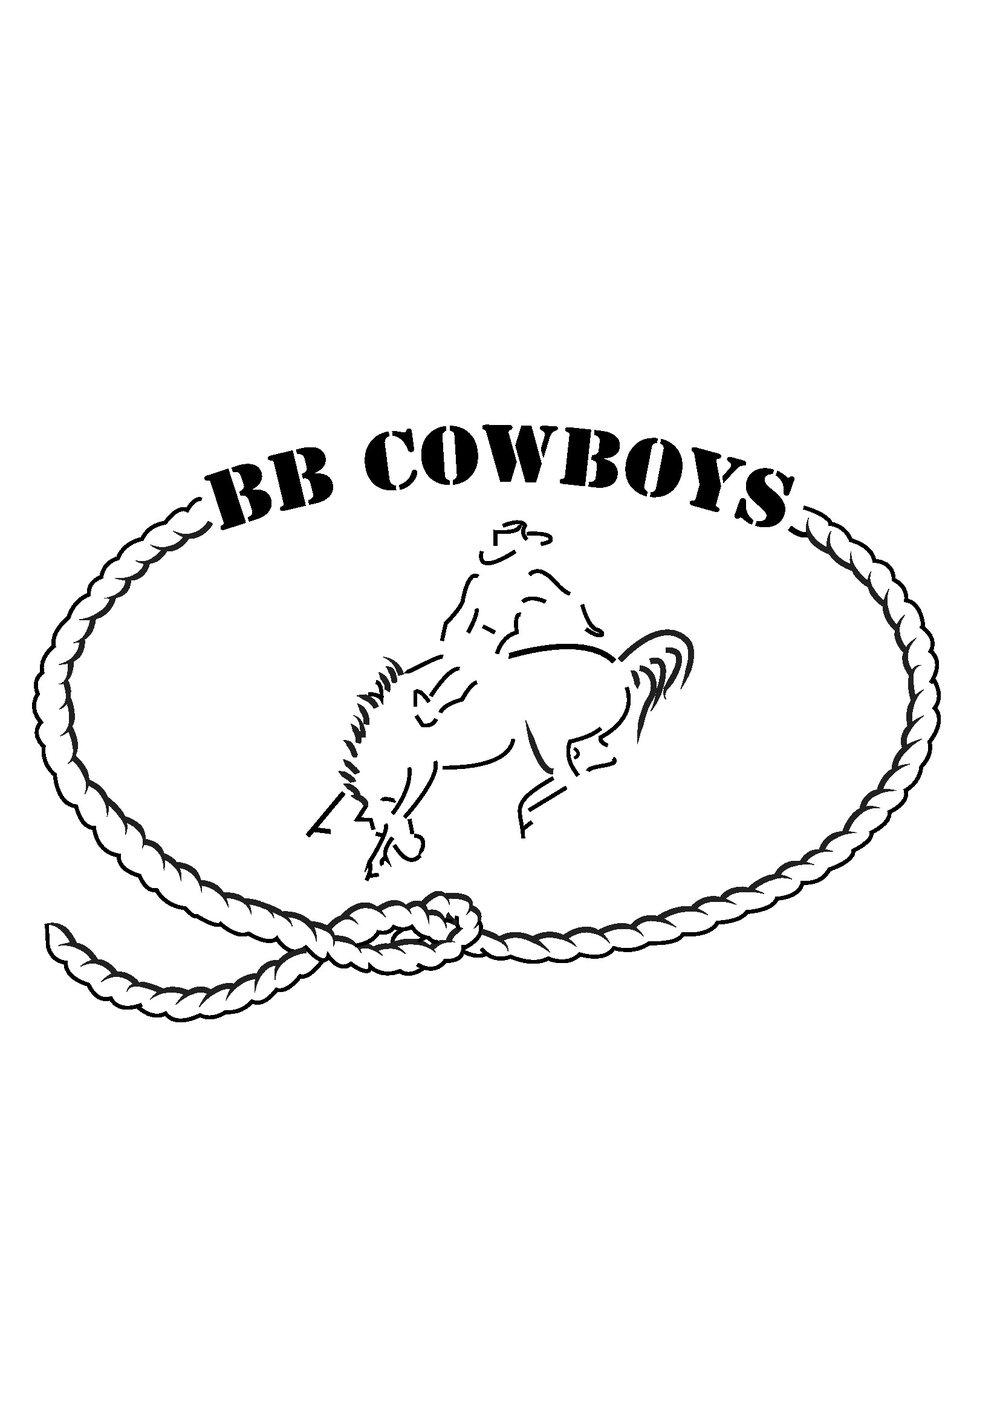 BB cowboys.jpg